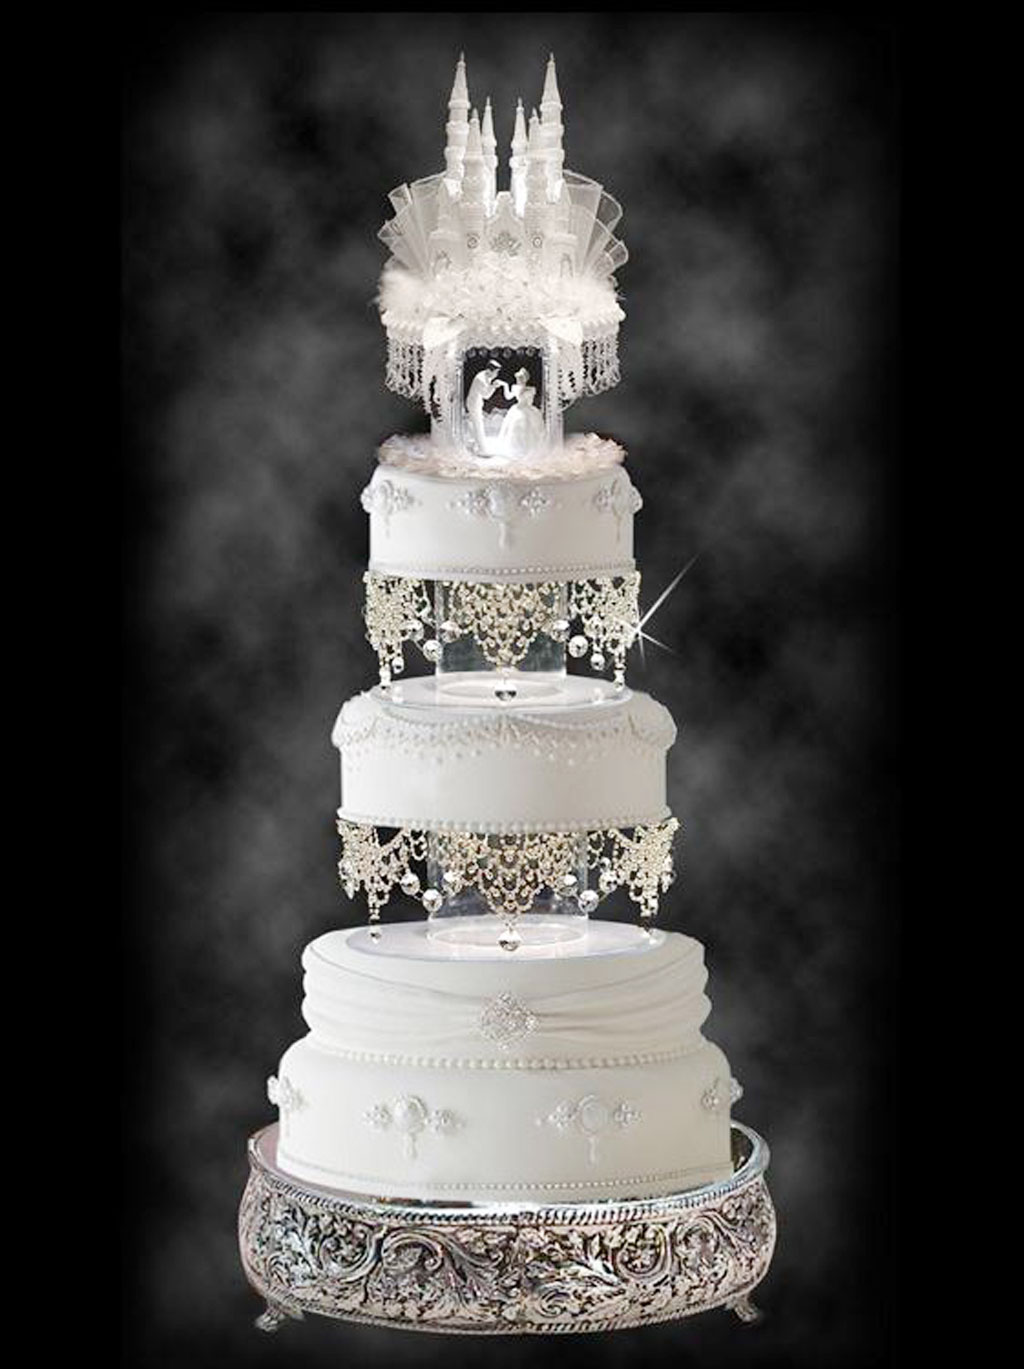 Lighted Cinderella Castle Wedding Cake Wedding Cake